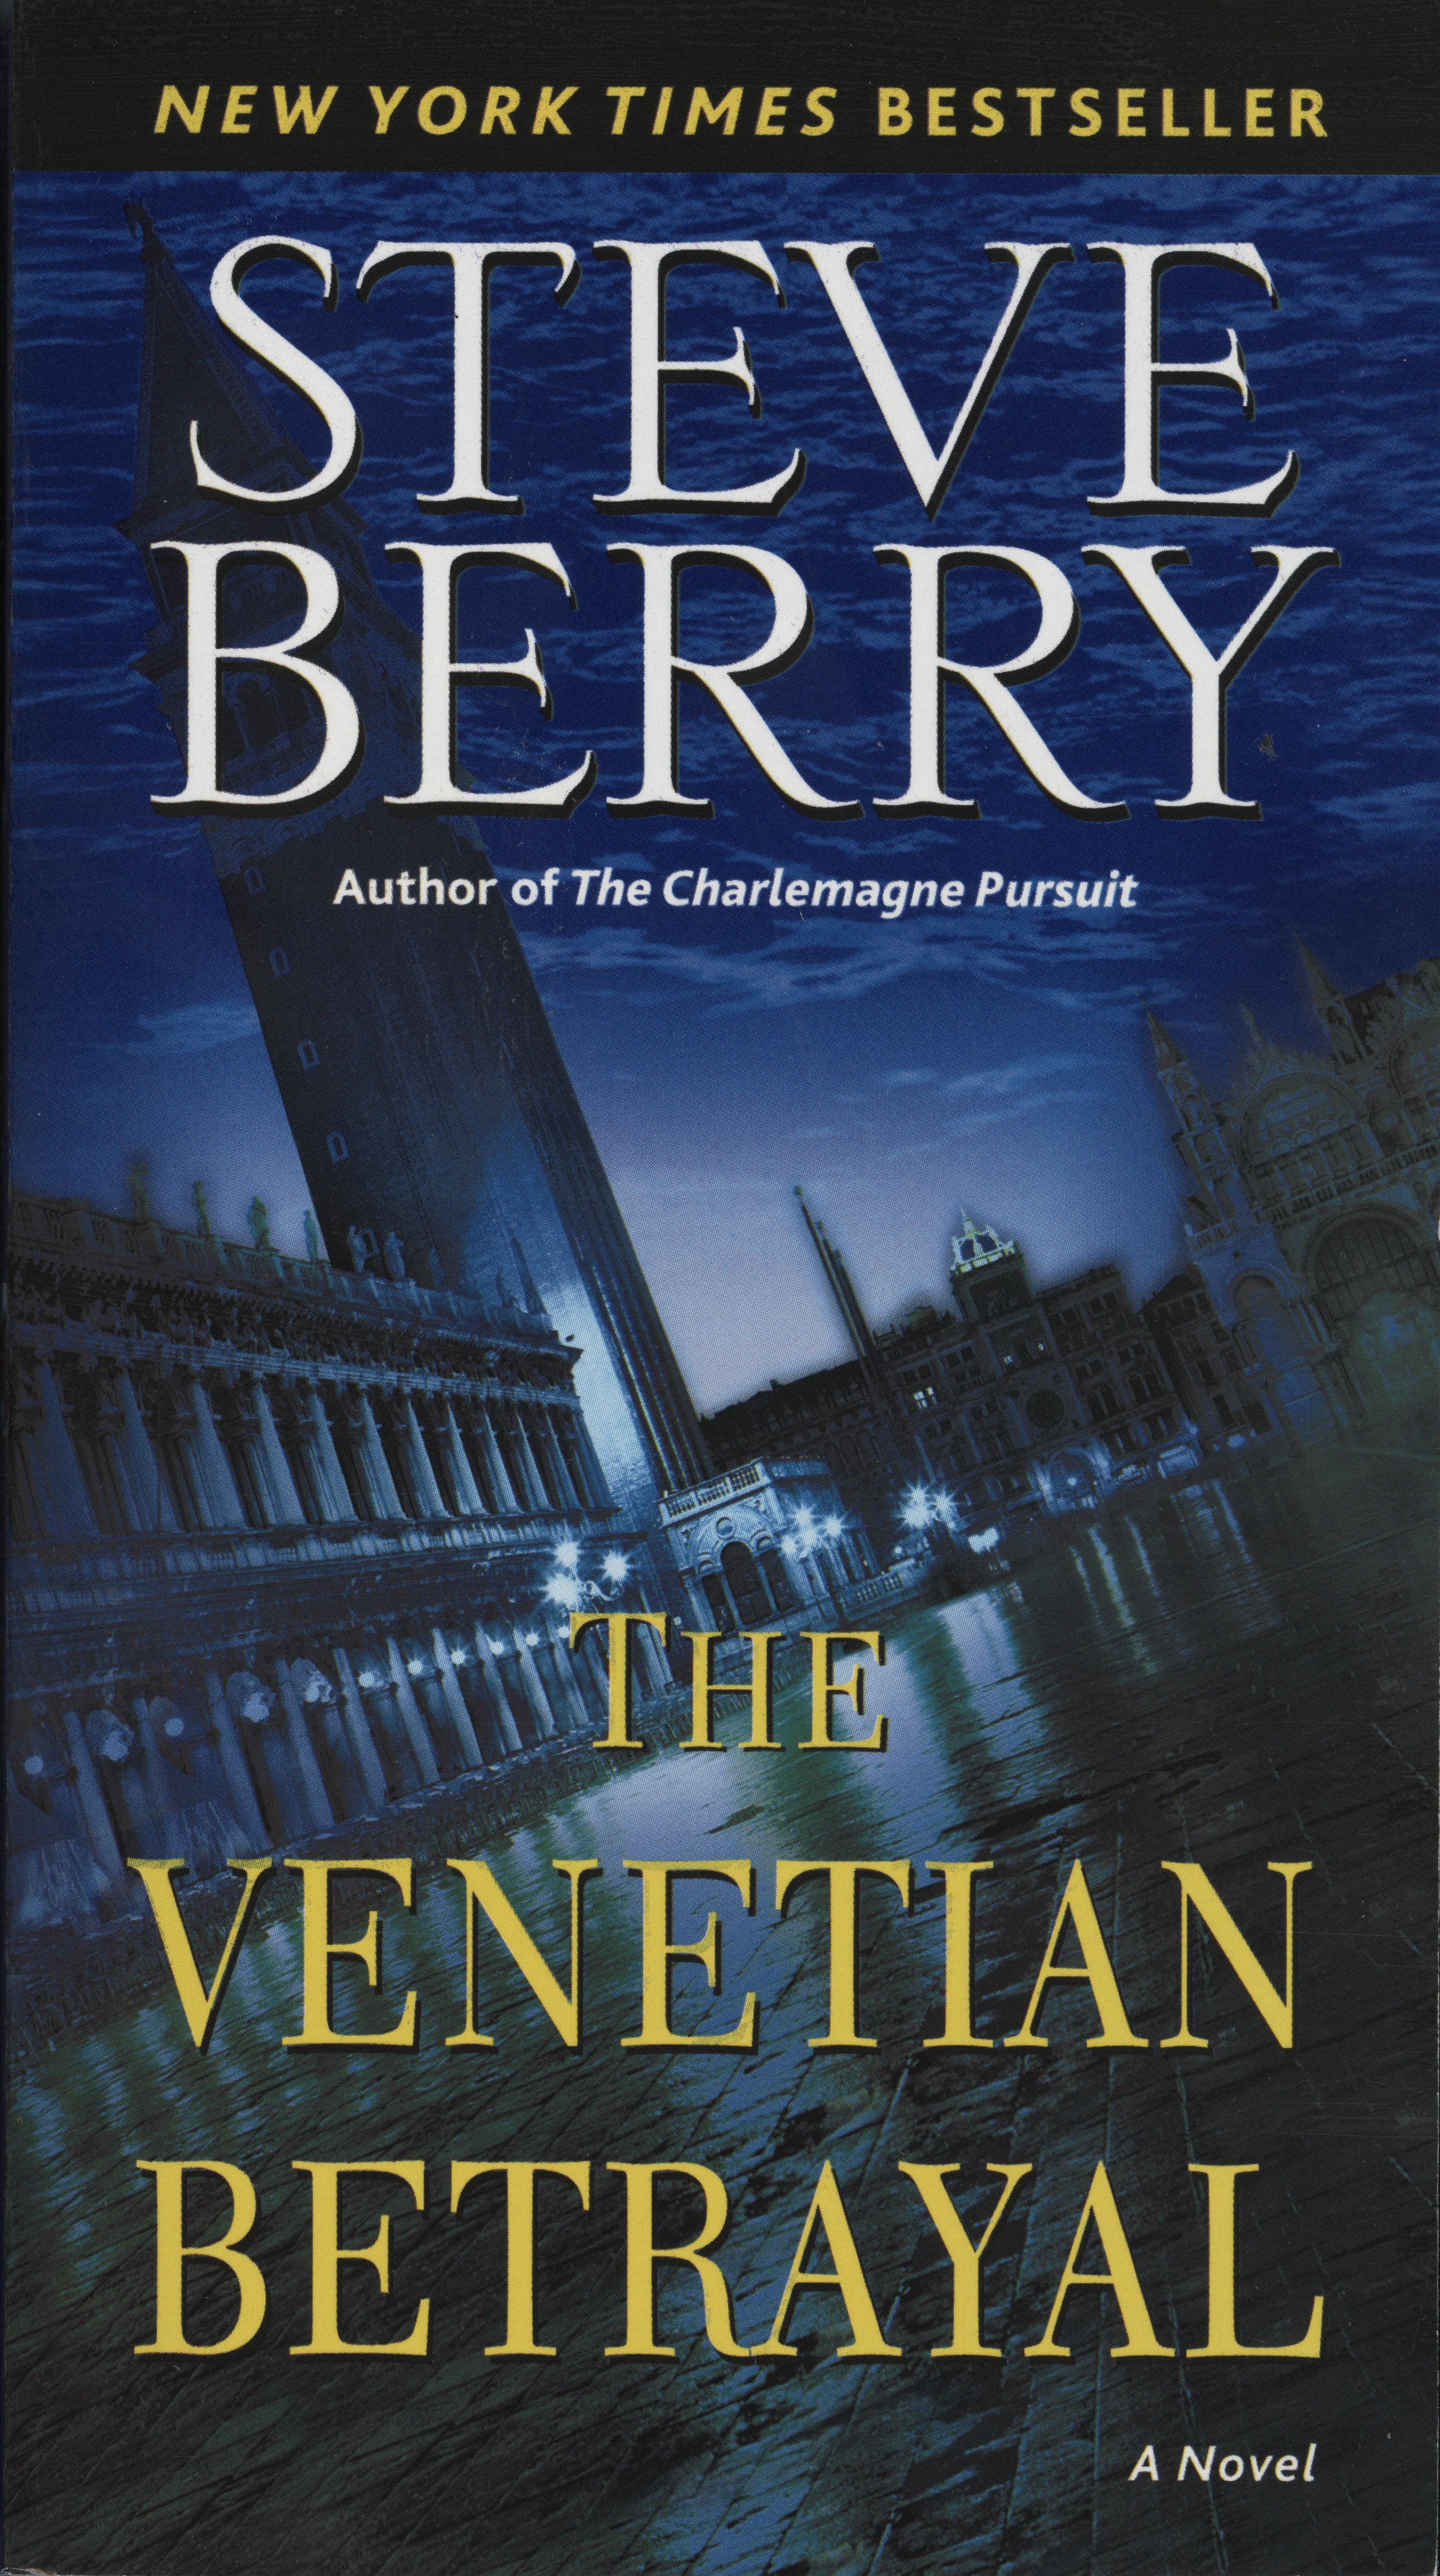 The Venetian betrayal cover image